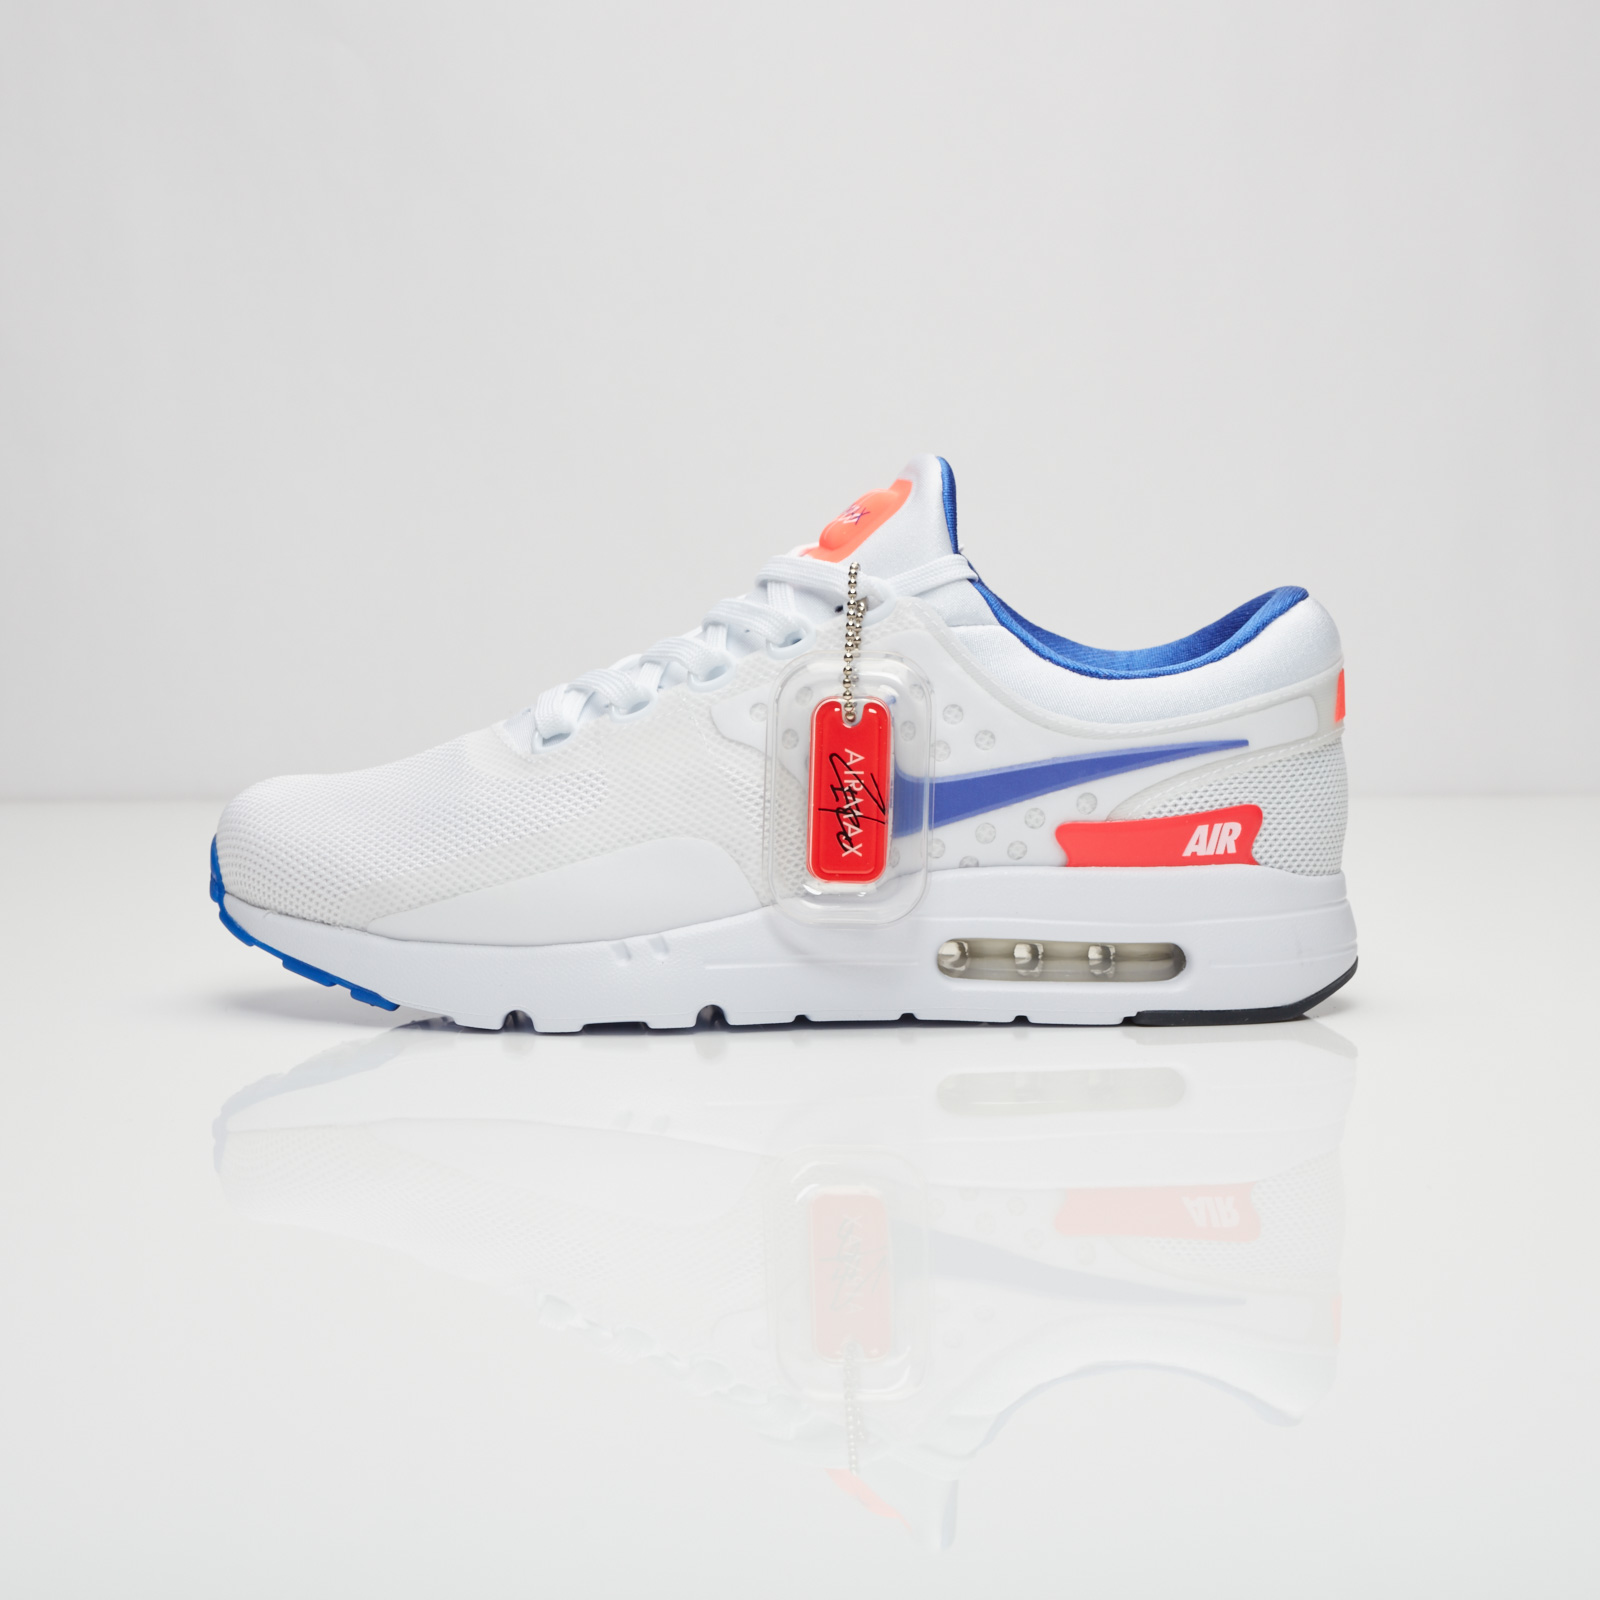 san francisco cfcae 51a03 Nike Air Max Zero QS - 789695-105 - Sneakersnstuff   sneakers   streetwear  online since 1999